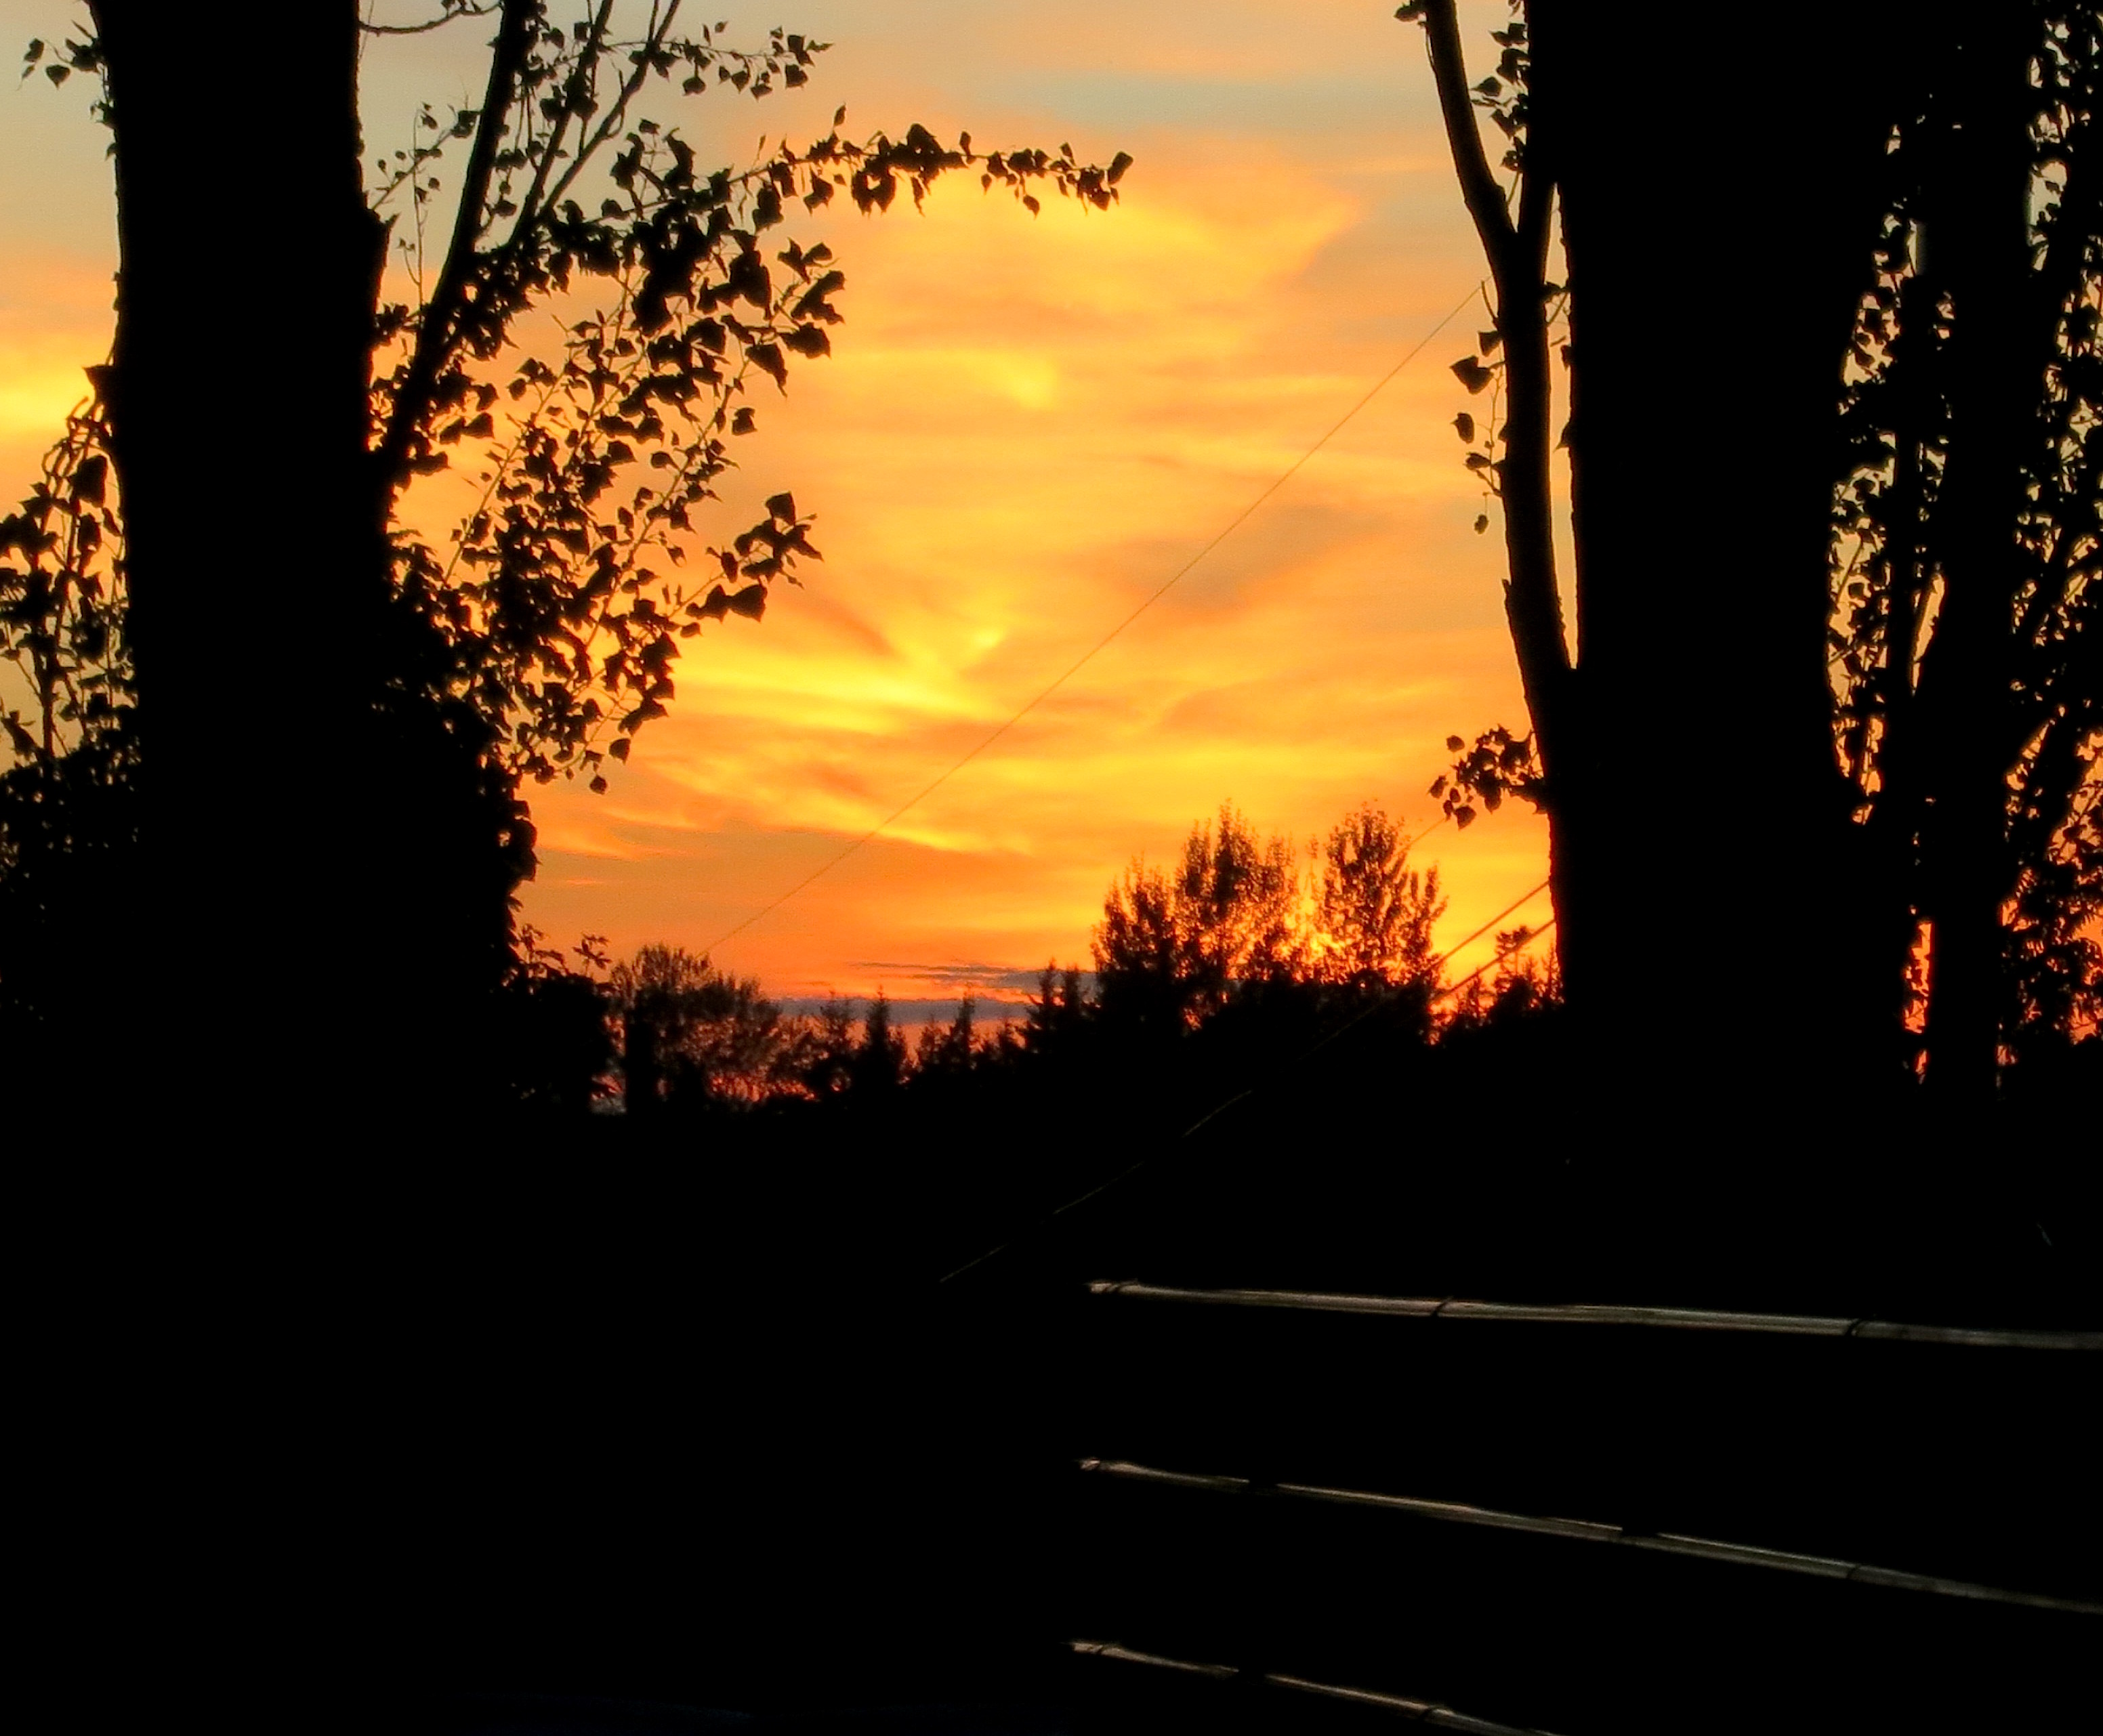 sunset9915